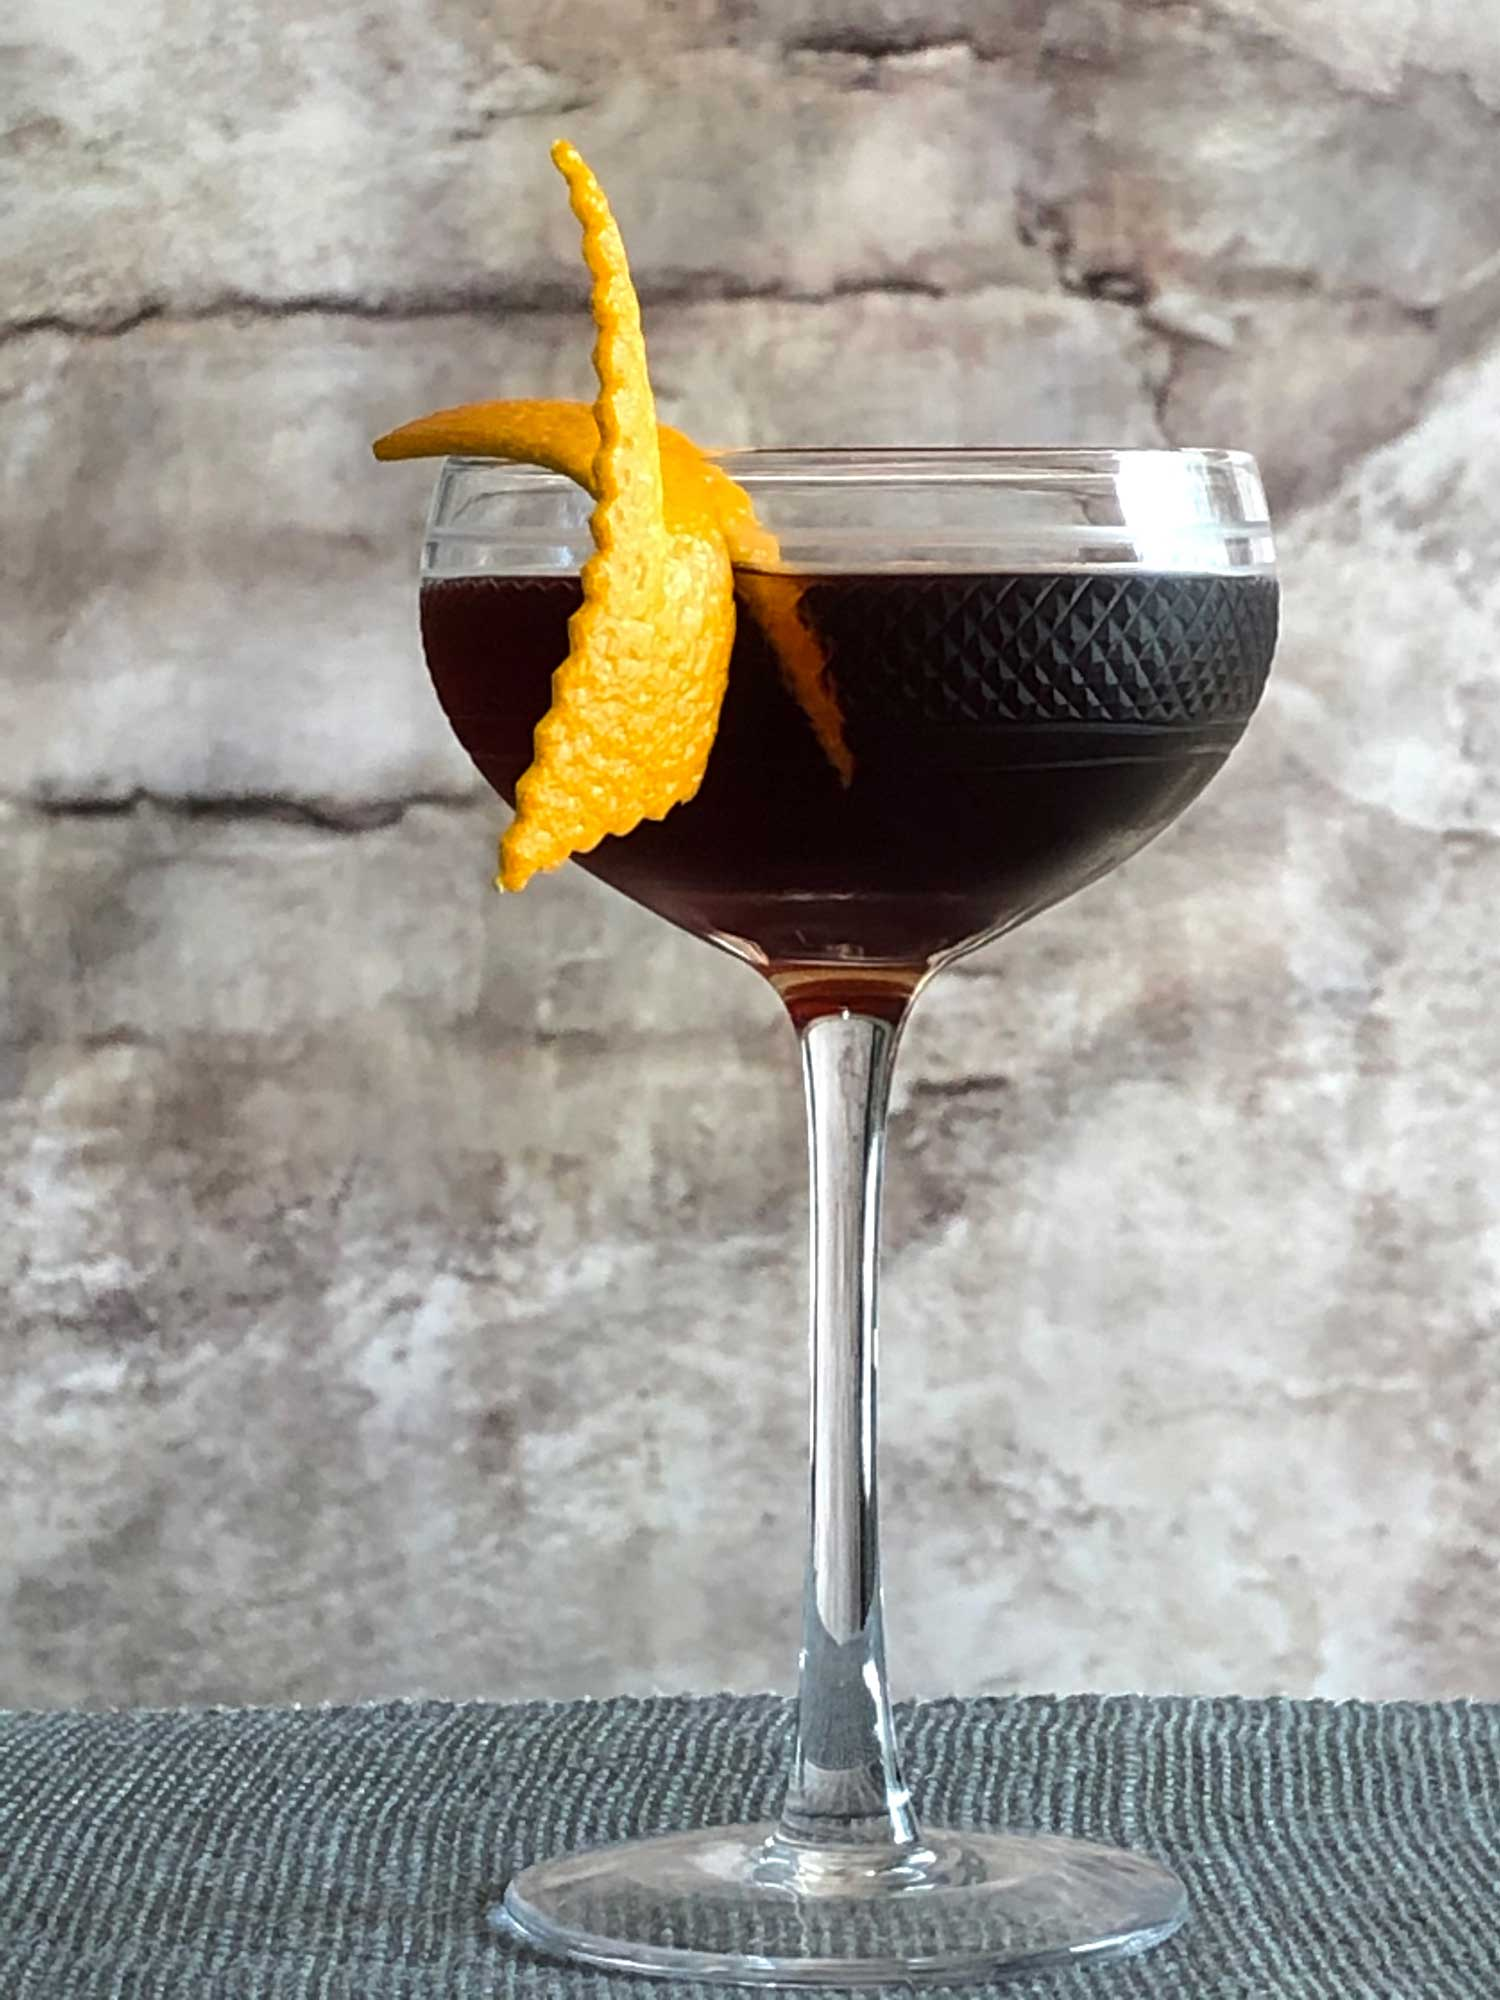 An example of the La Revuelta, the mixed drink (cocktail), by Lynn Falk, Acacia, Pittsburgh, featuring Maggie's Farm La Revuelta Dark Rum, Cocchi Dopo Teatro Vermouth Amaro, Amaro Sfumato Rabarbaro, and Bittermens Xocolatl Mole Bitters; photo by Lee Edwards